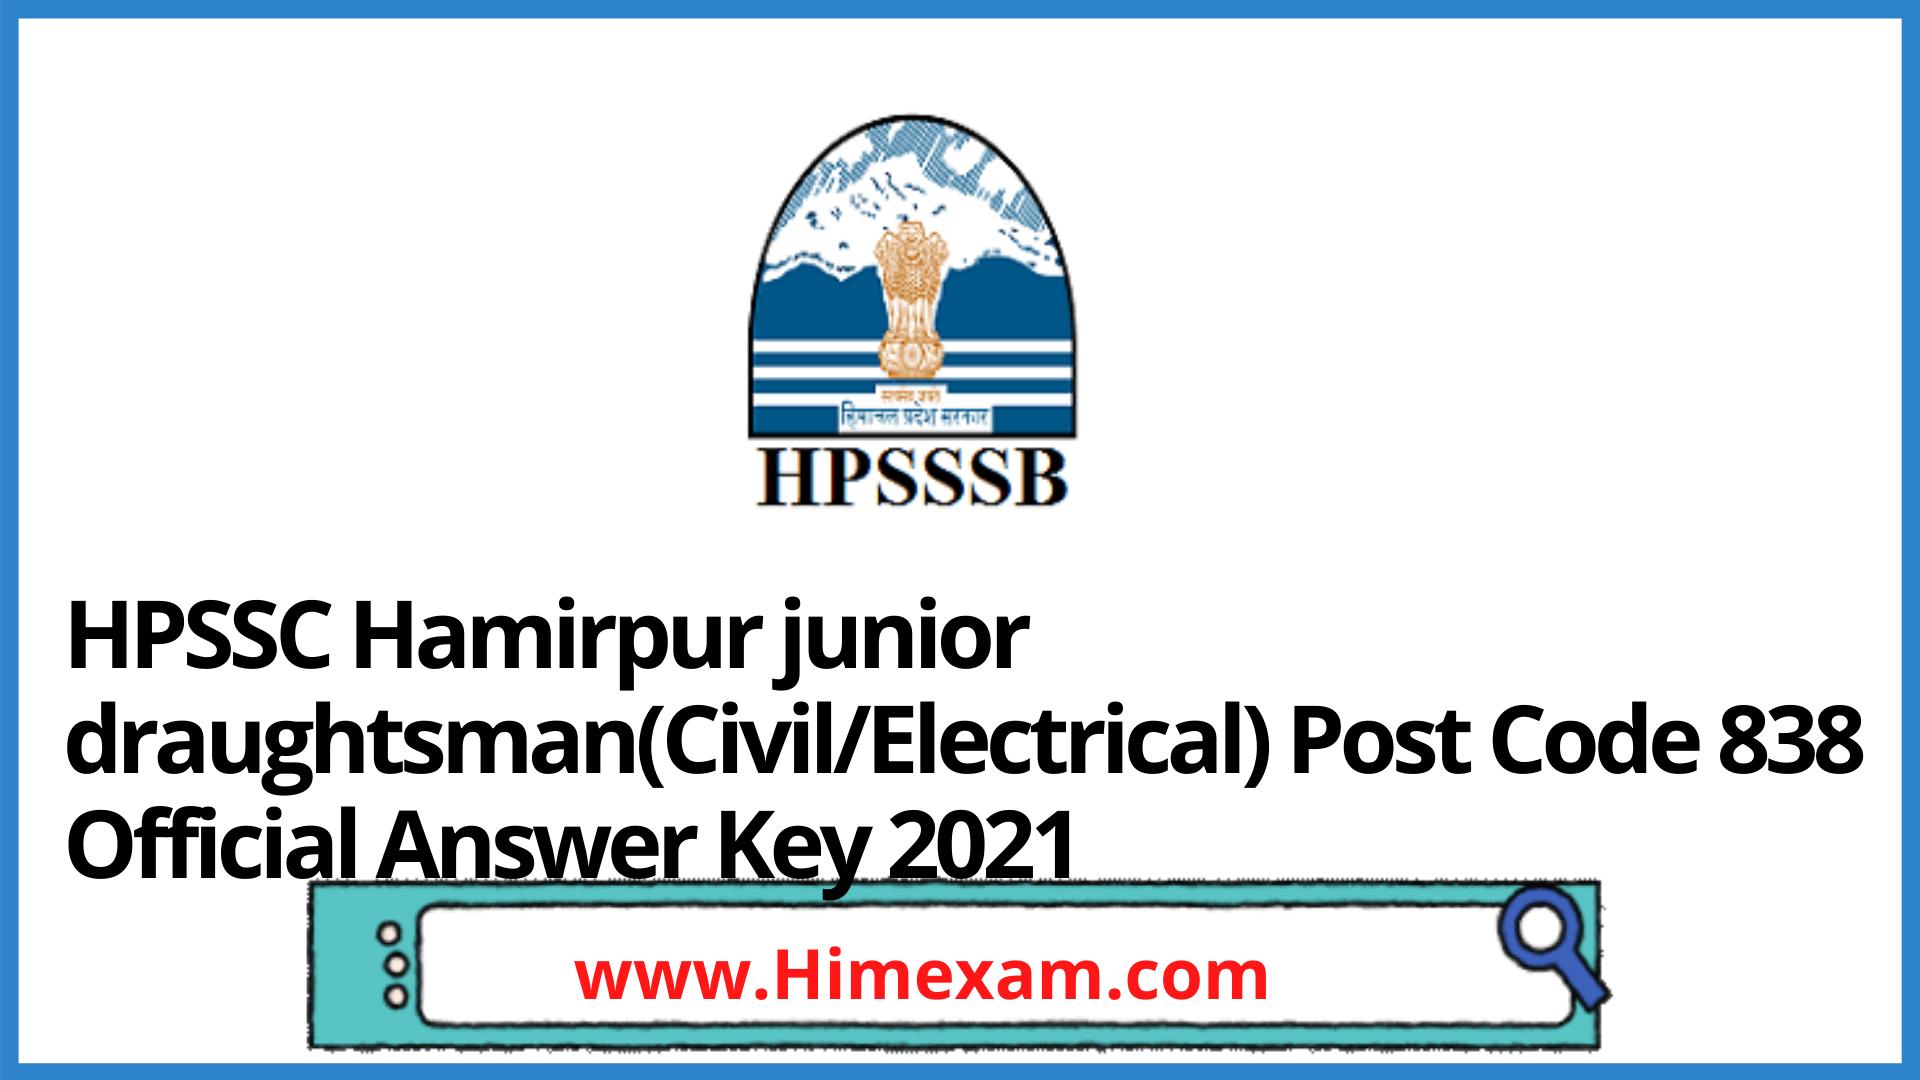 HPSSC Hamirpur junior draughtsman(Civil/Electrical) Post Code 838 Official Answer Key 2021